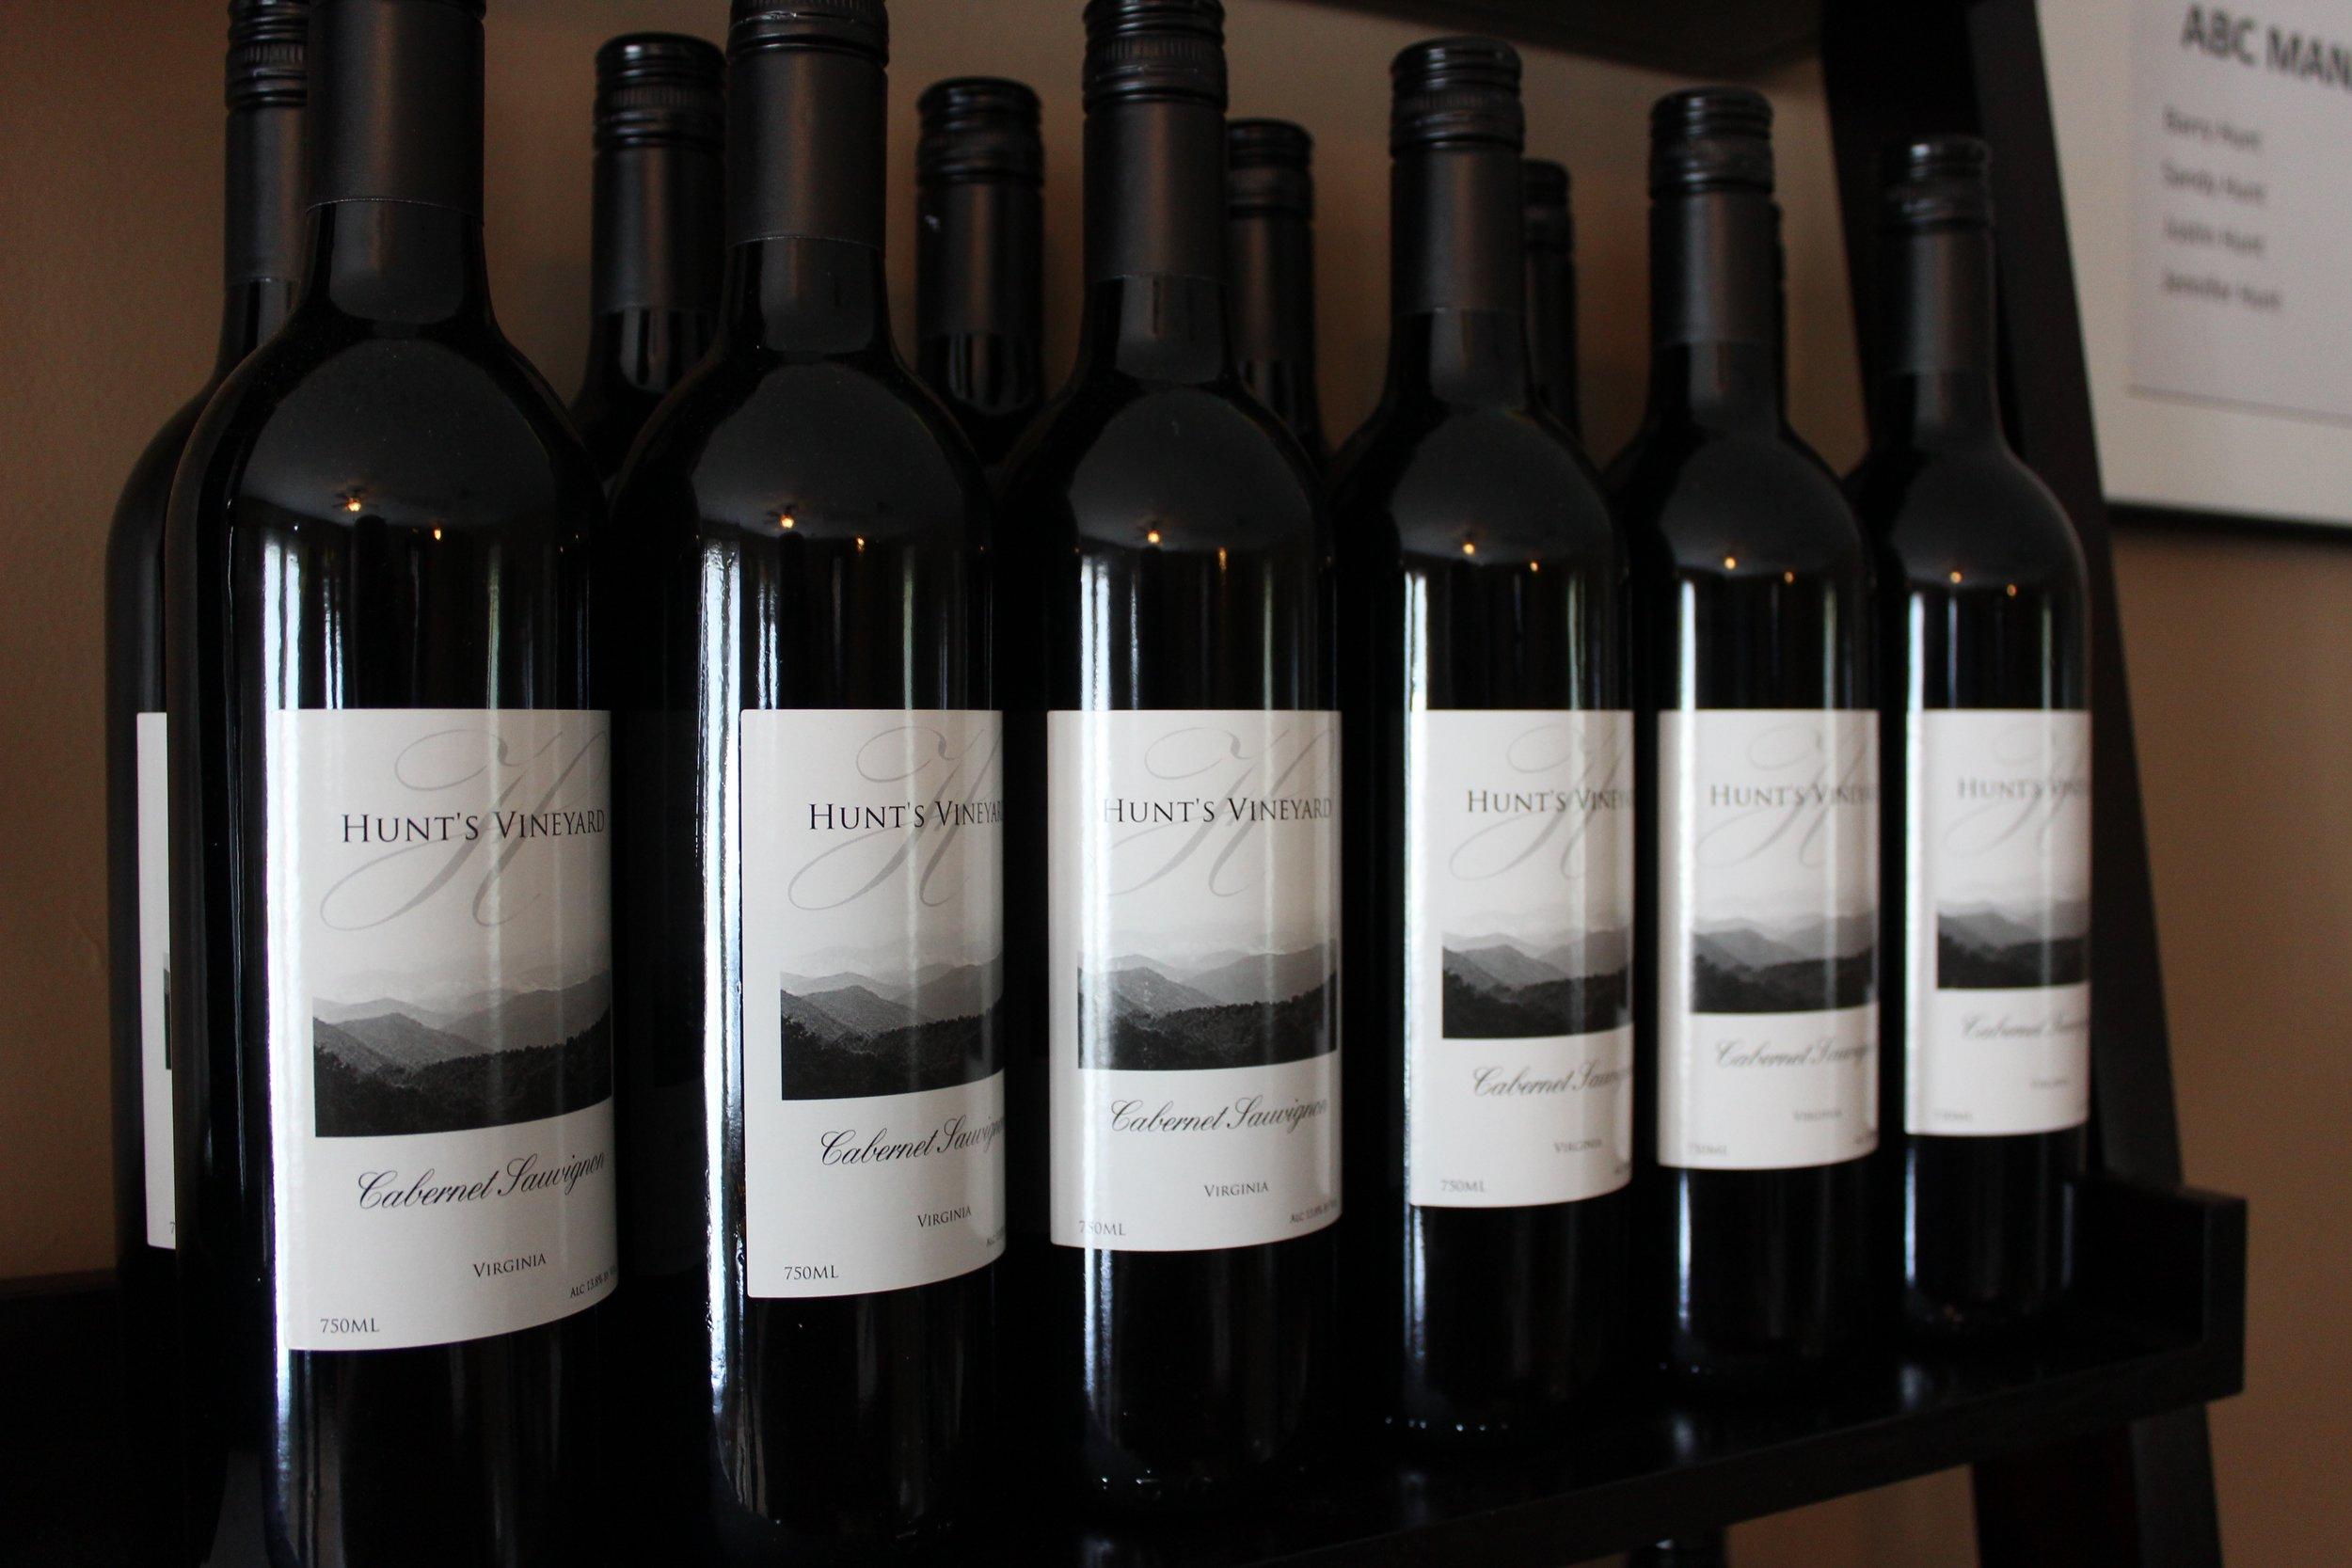 Hunts Vineyard